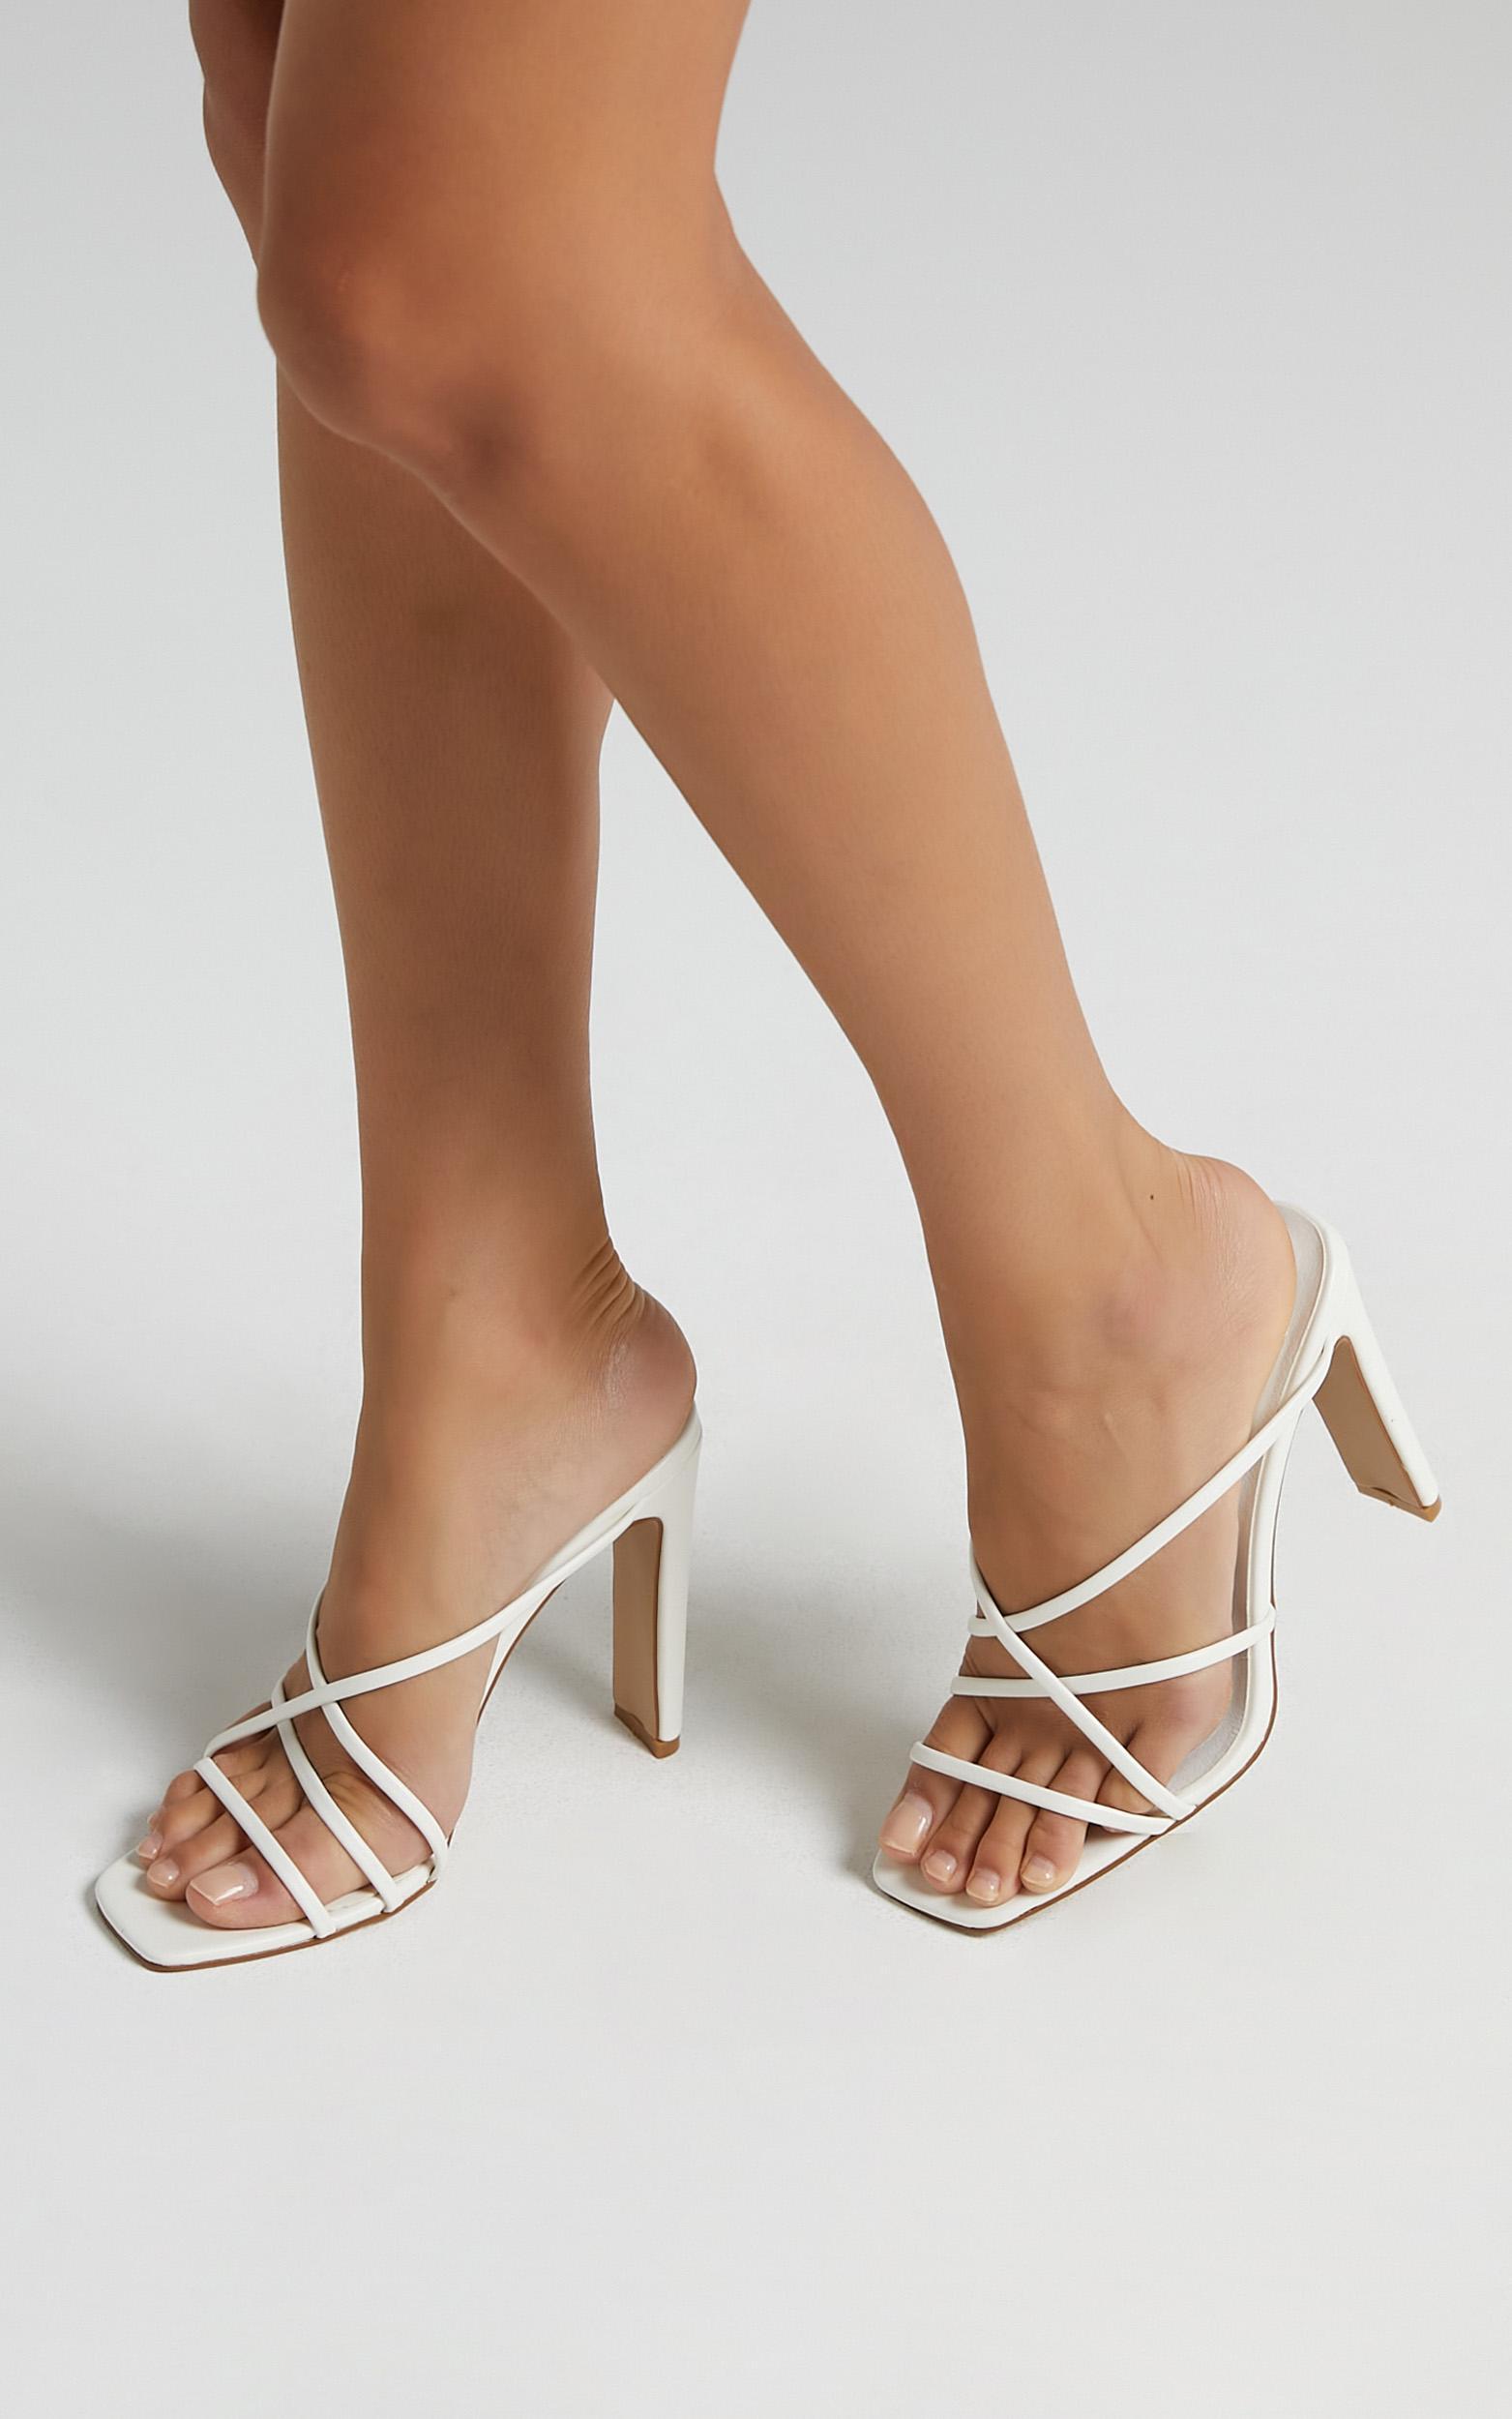 Billini - Yenta Heels in White - 5, White, hi-res image number null